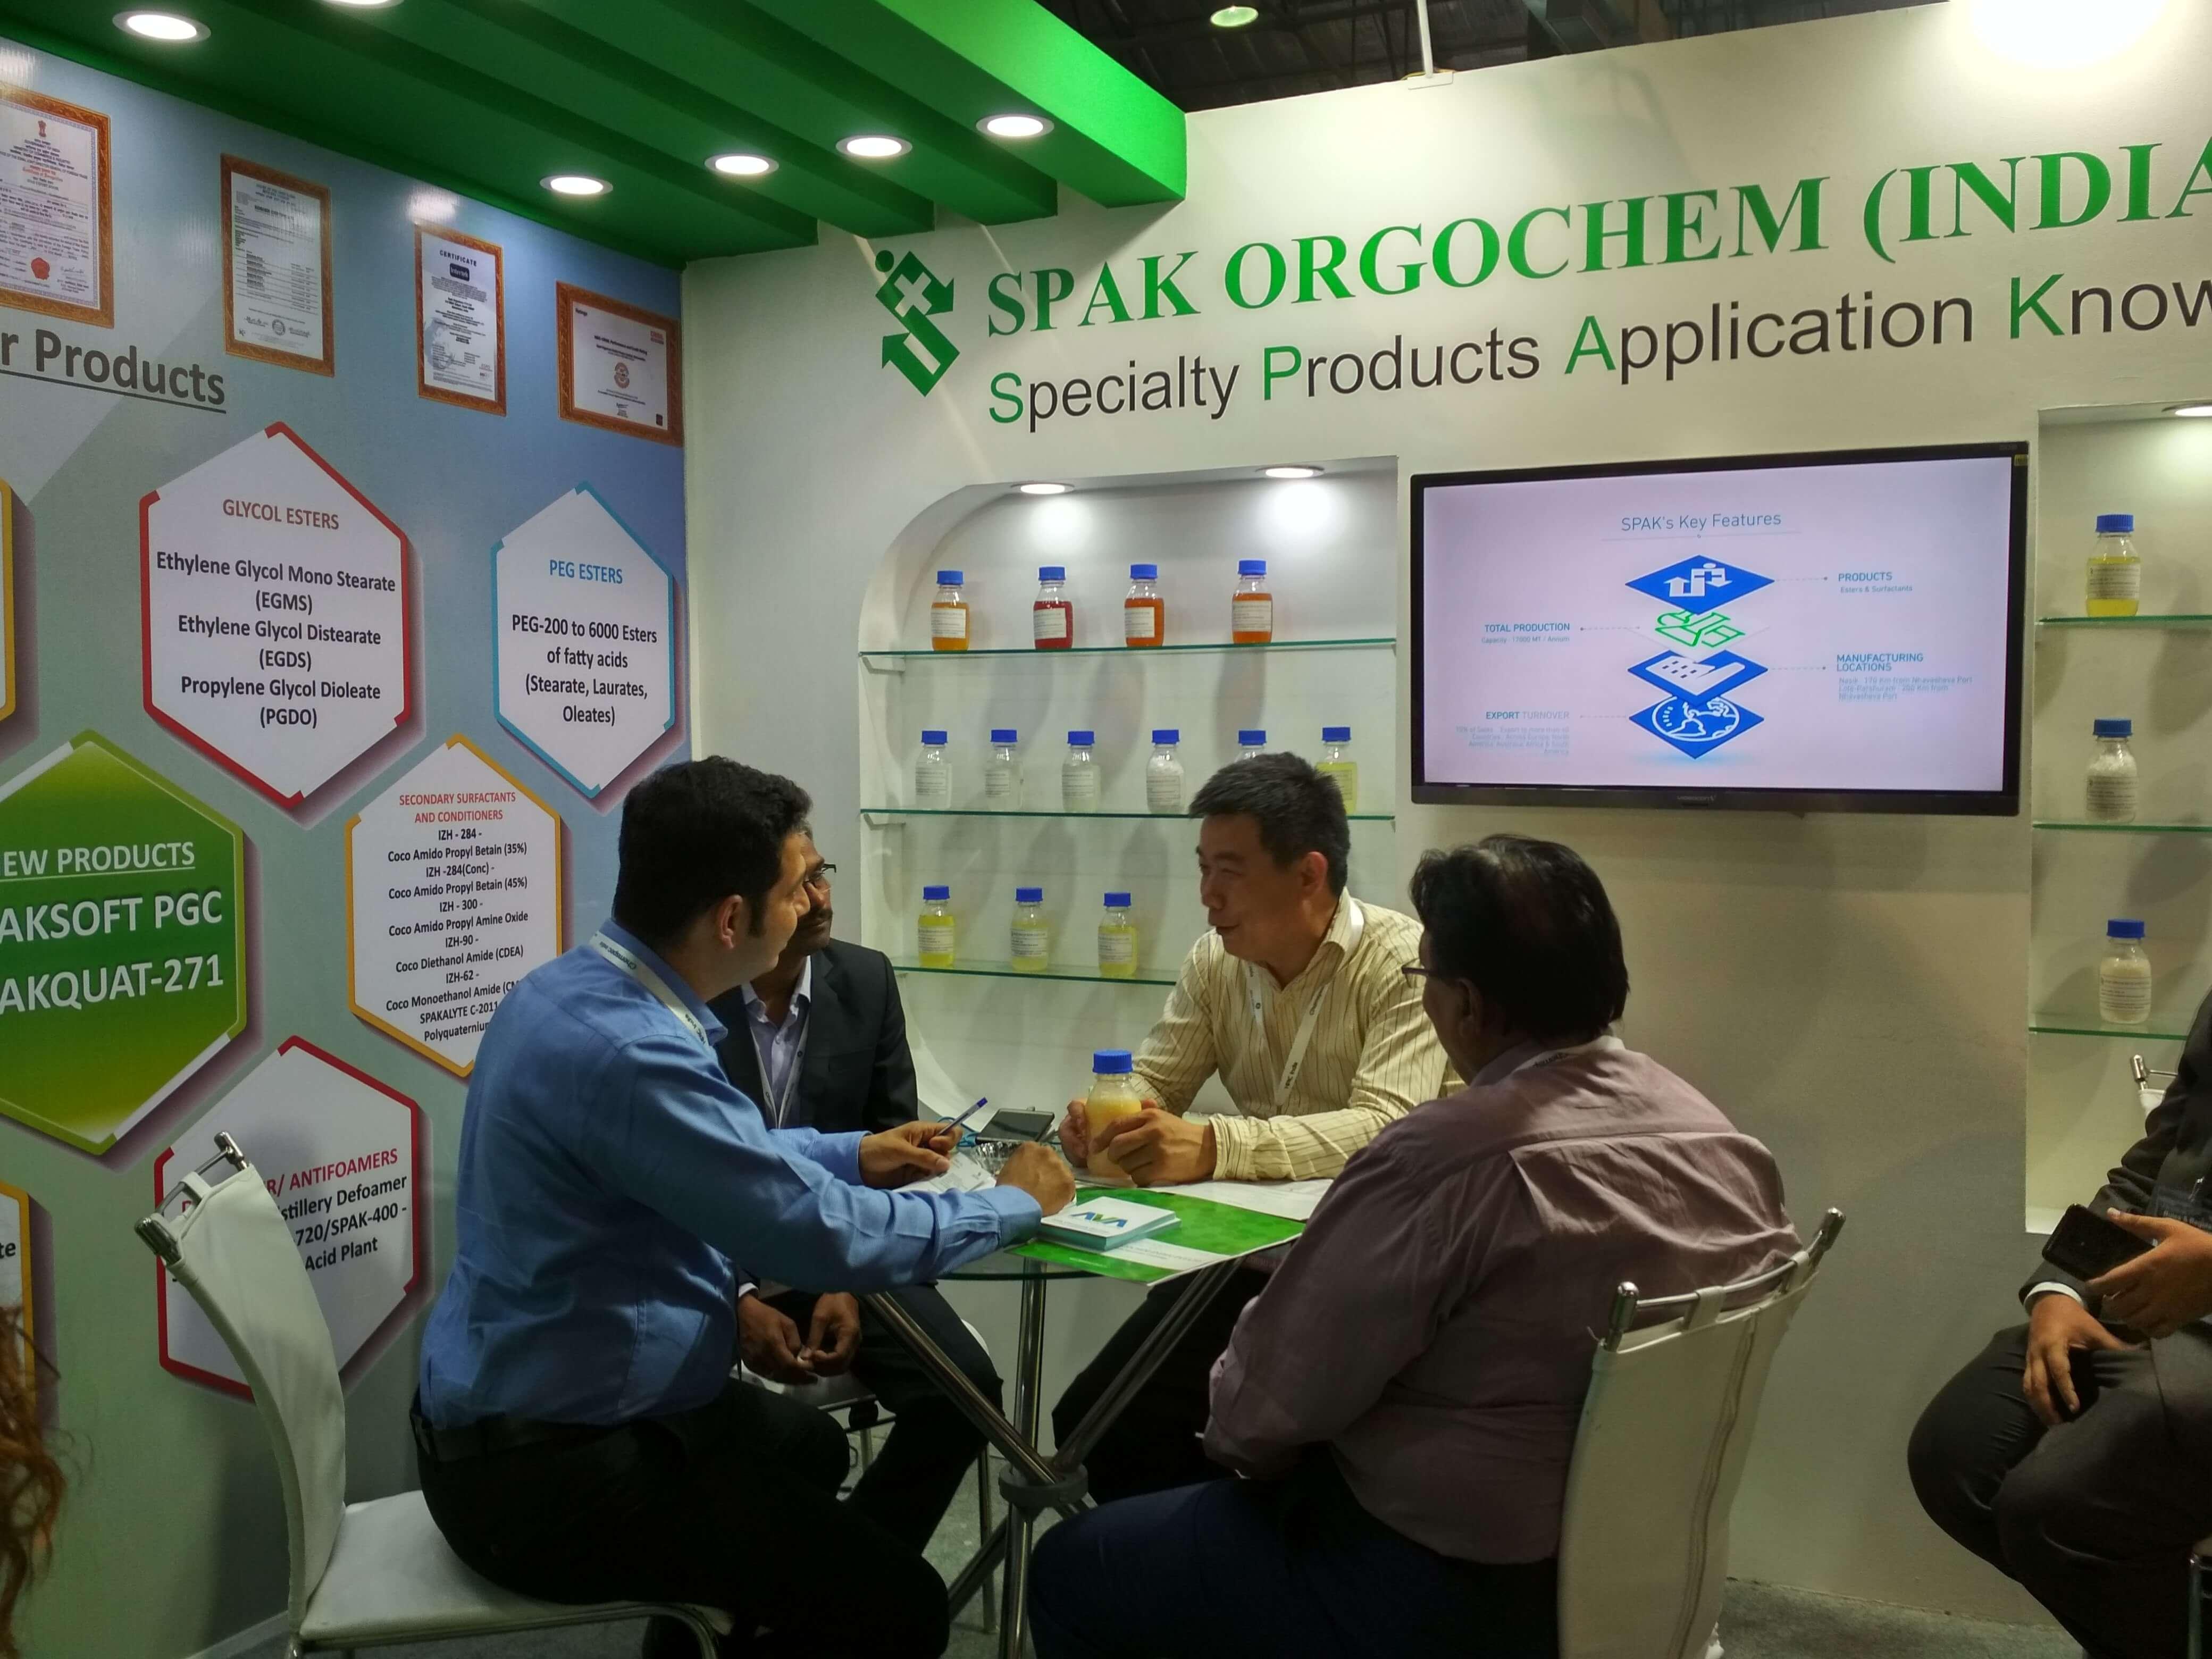 ChemSpec Mumbai, India 2018 - SPAK Orgochem